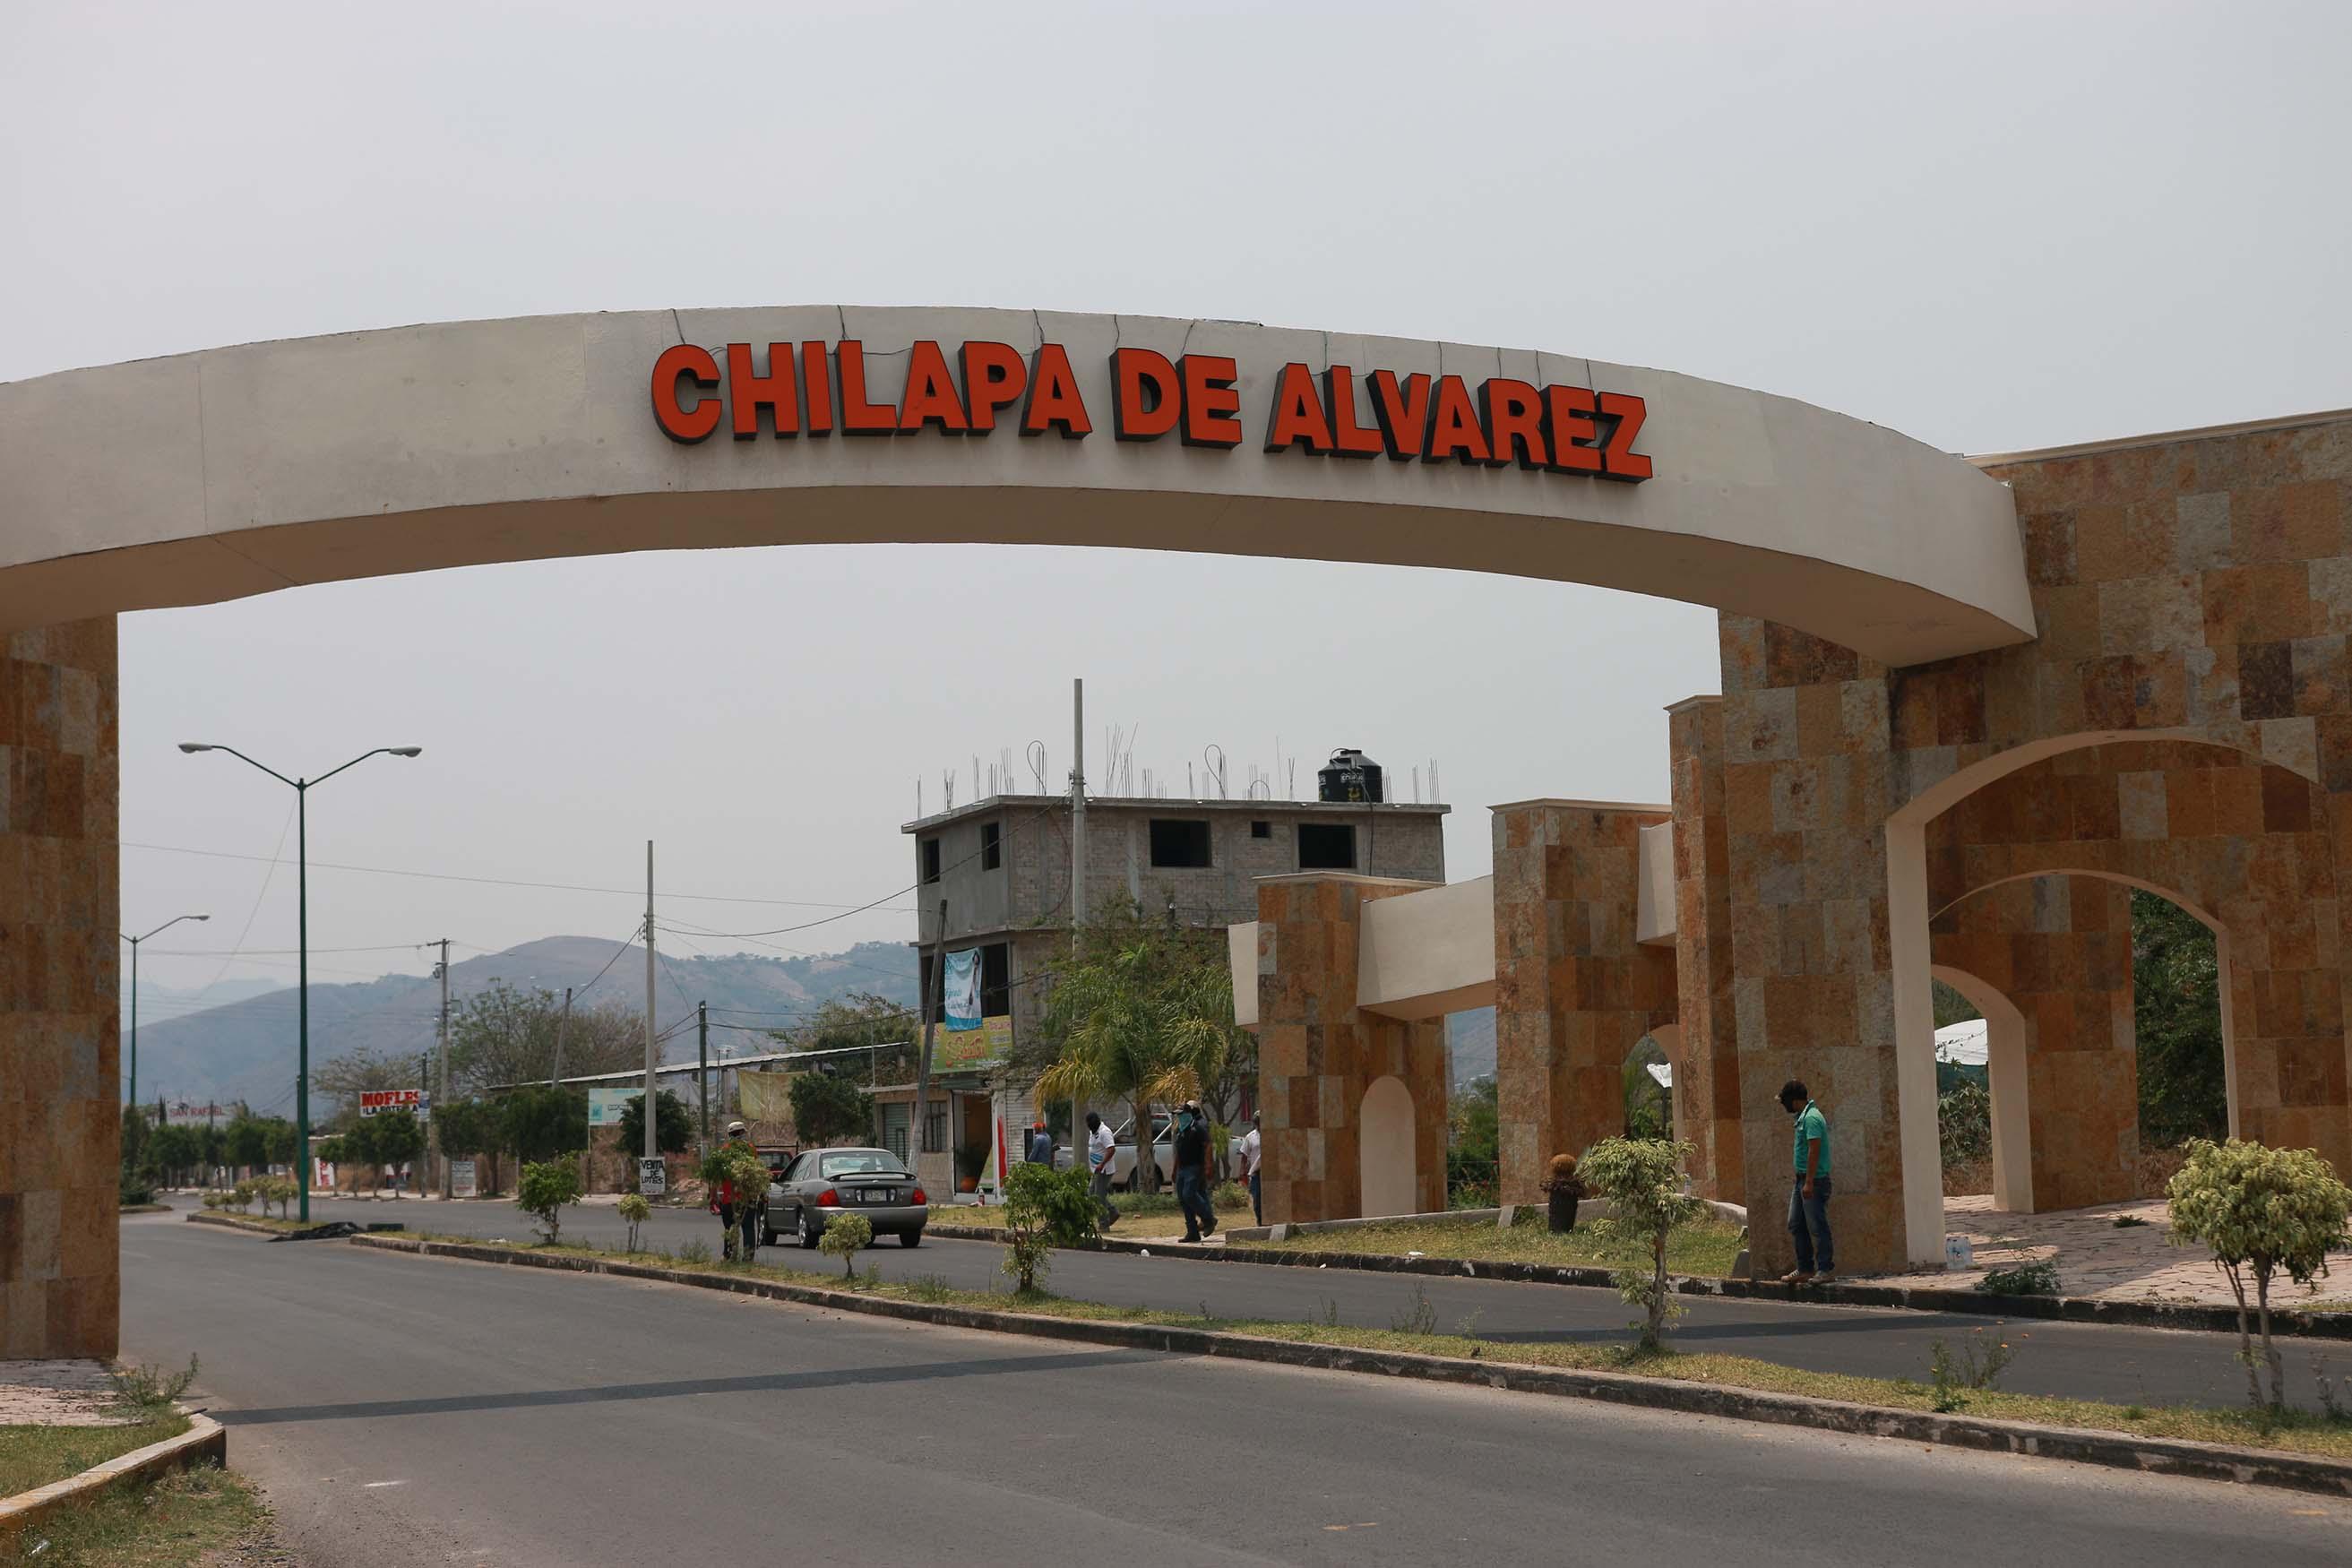 Resultado de imagen para chilapa de alvarez